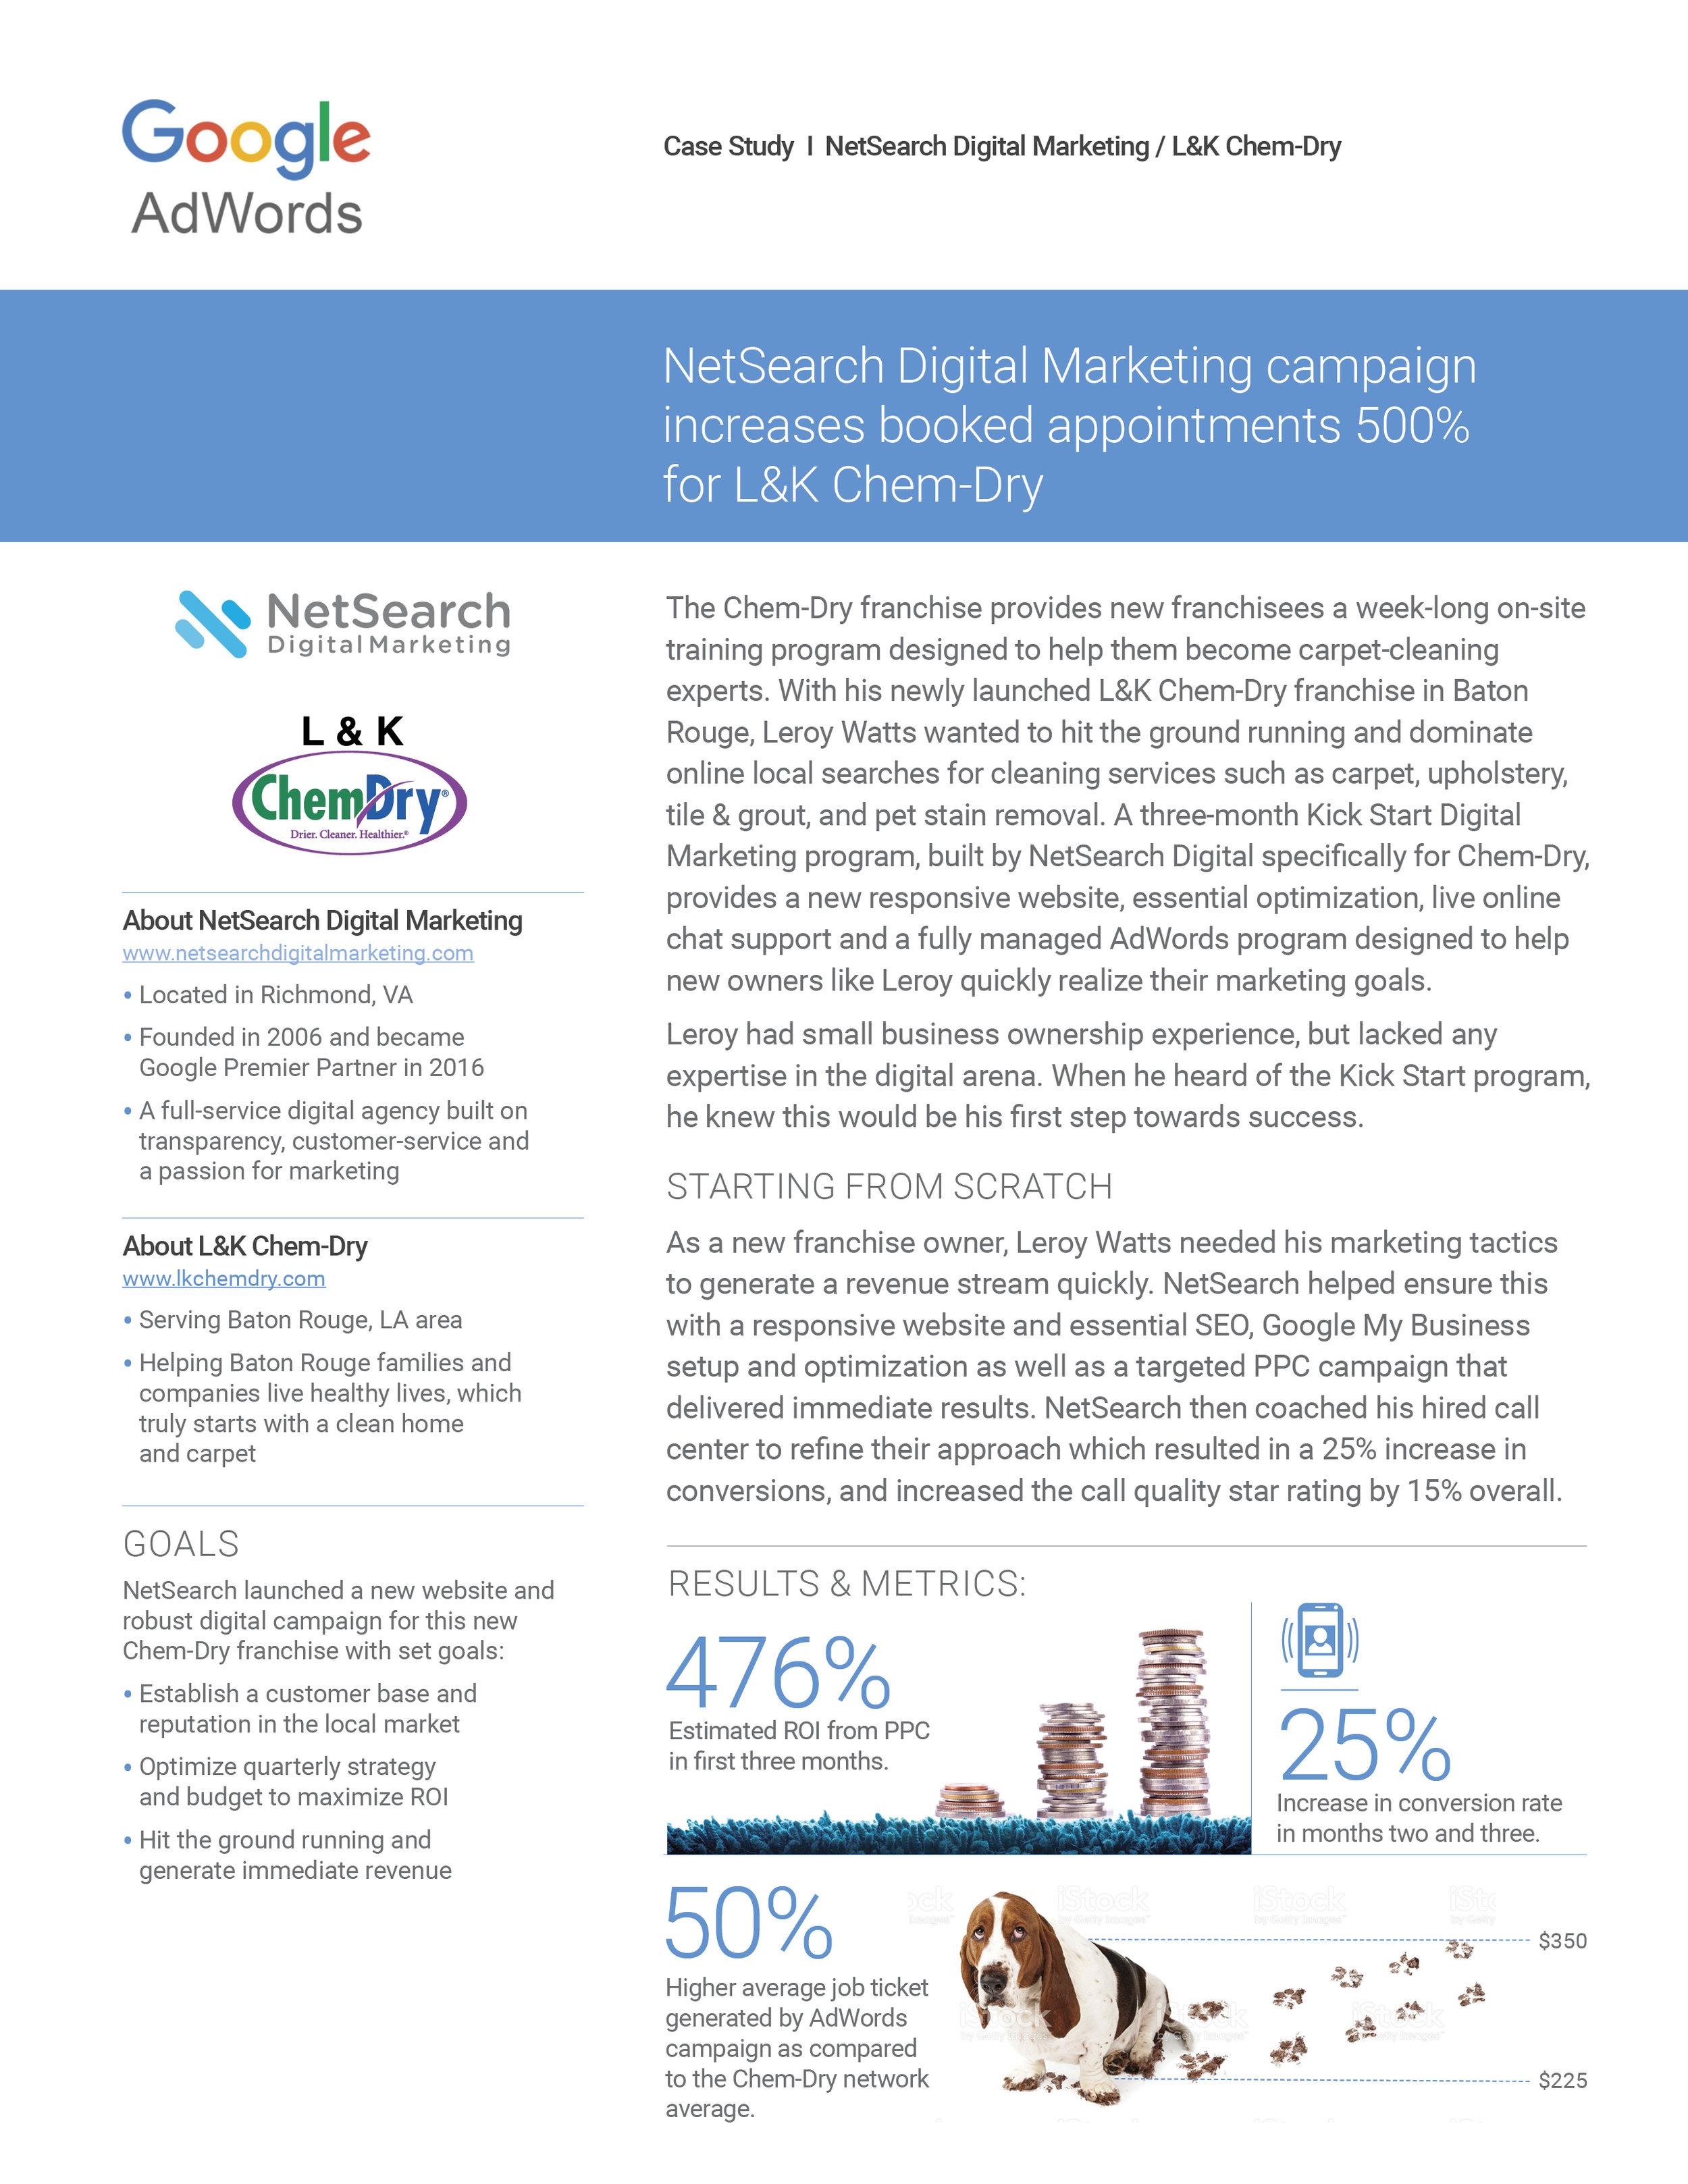 NetSearch-Chem-Dry-casestudy.jpg